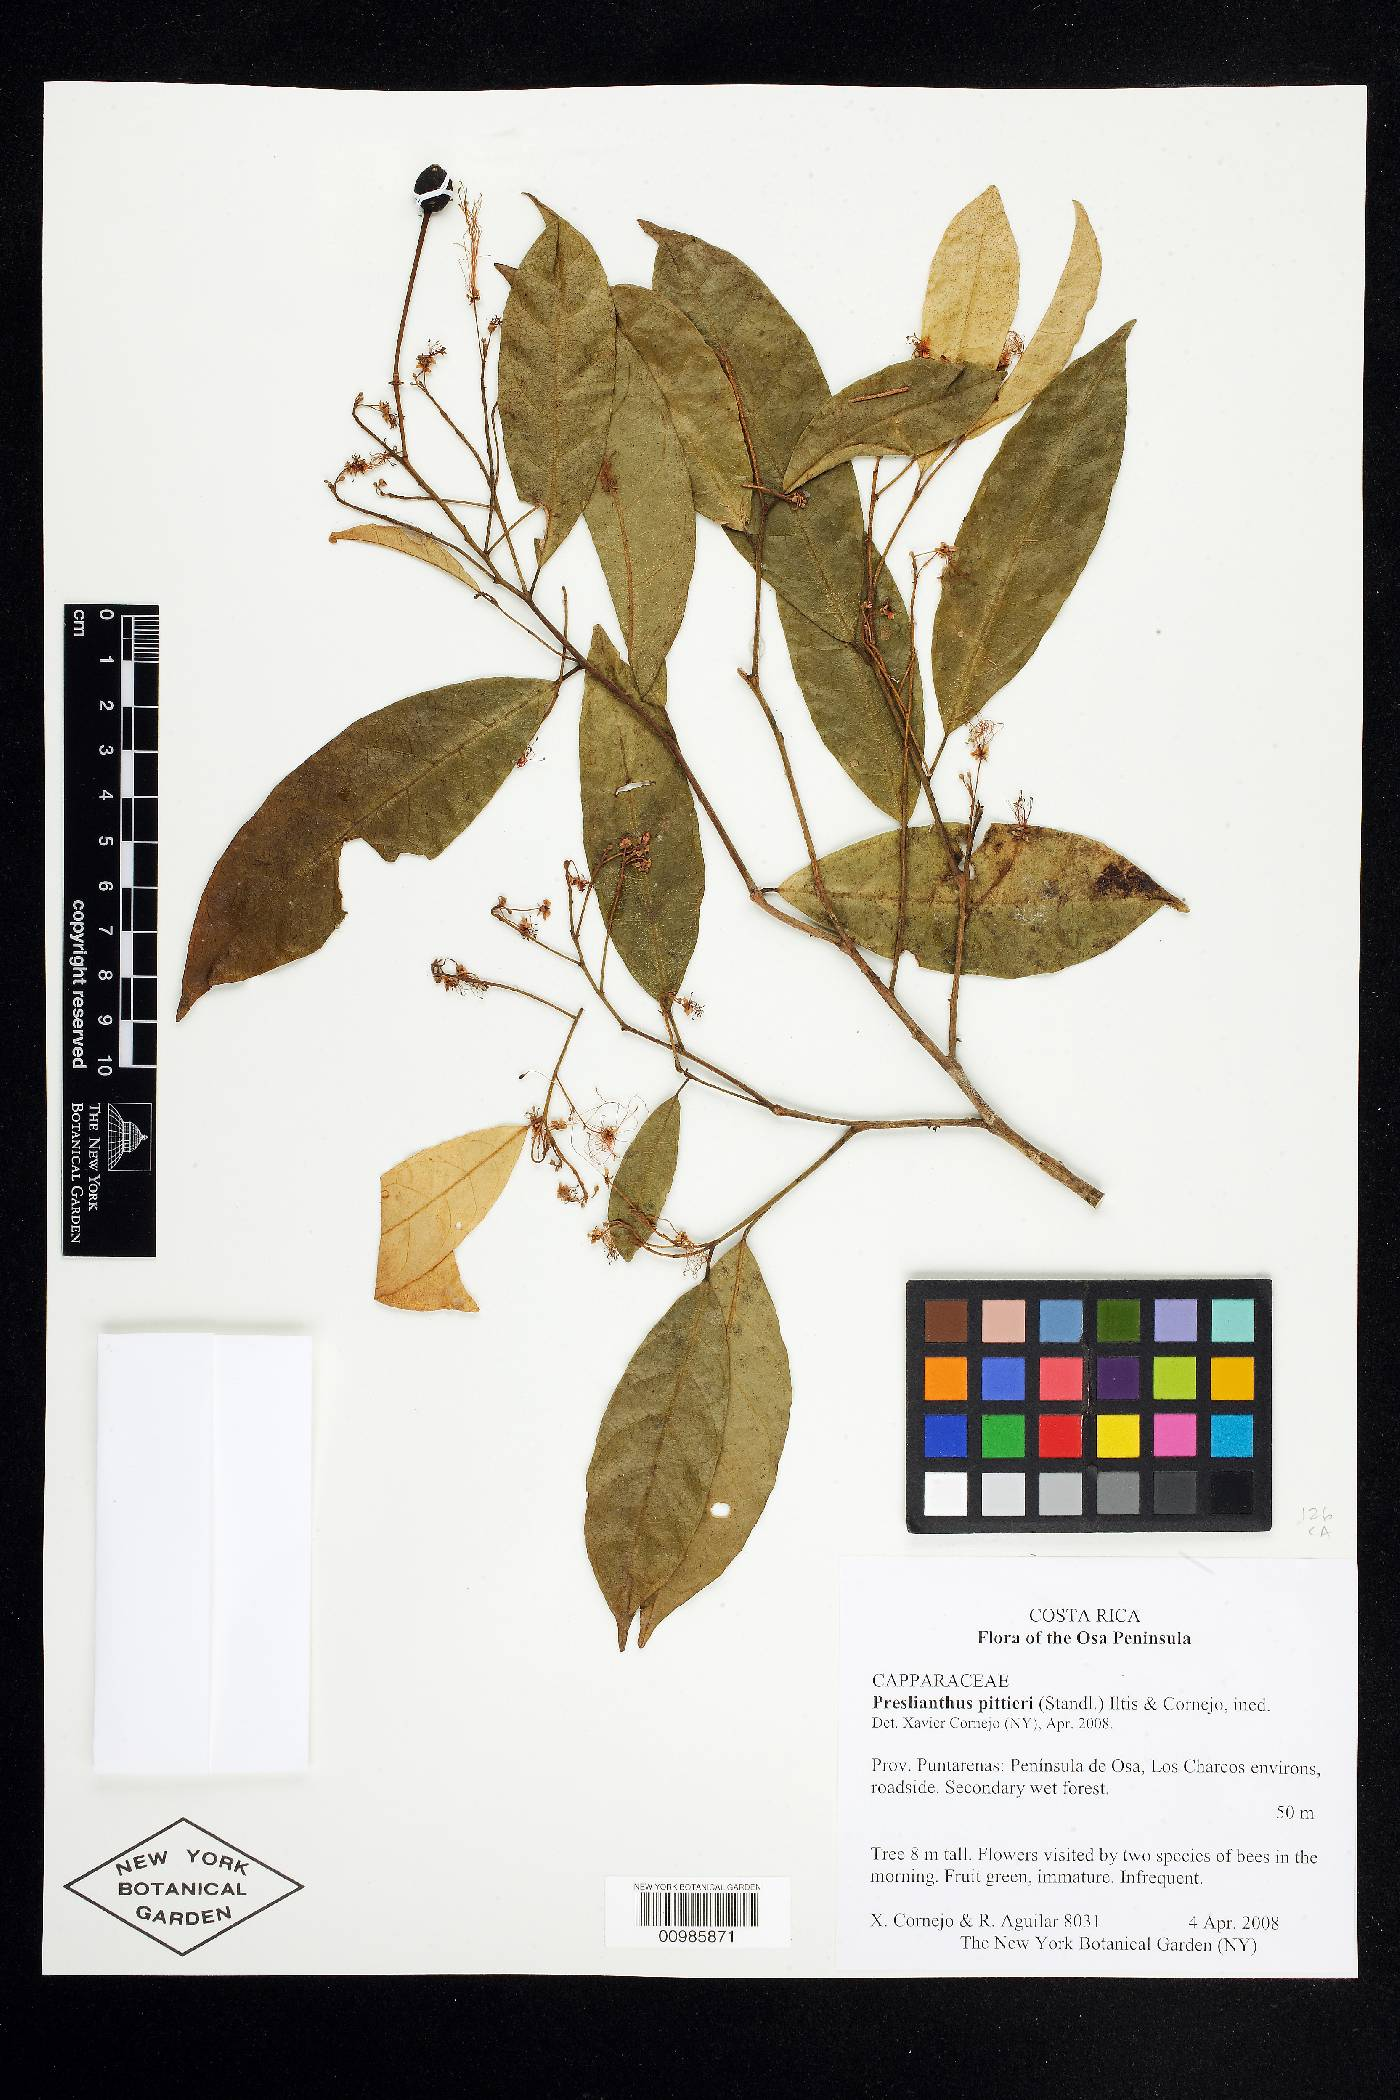 Preslianthus pittieri image